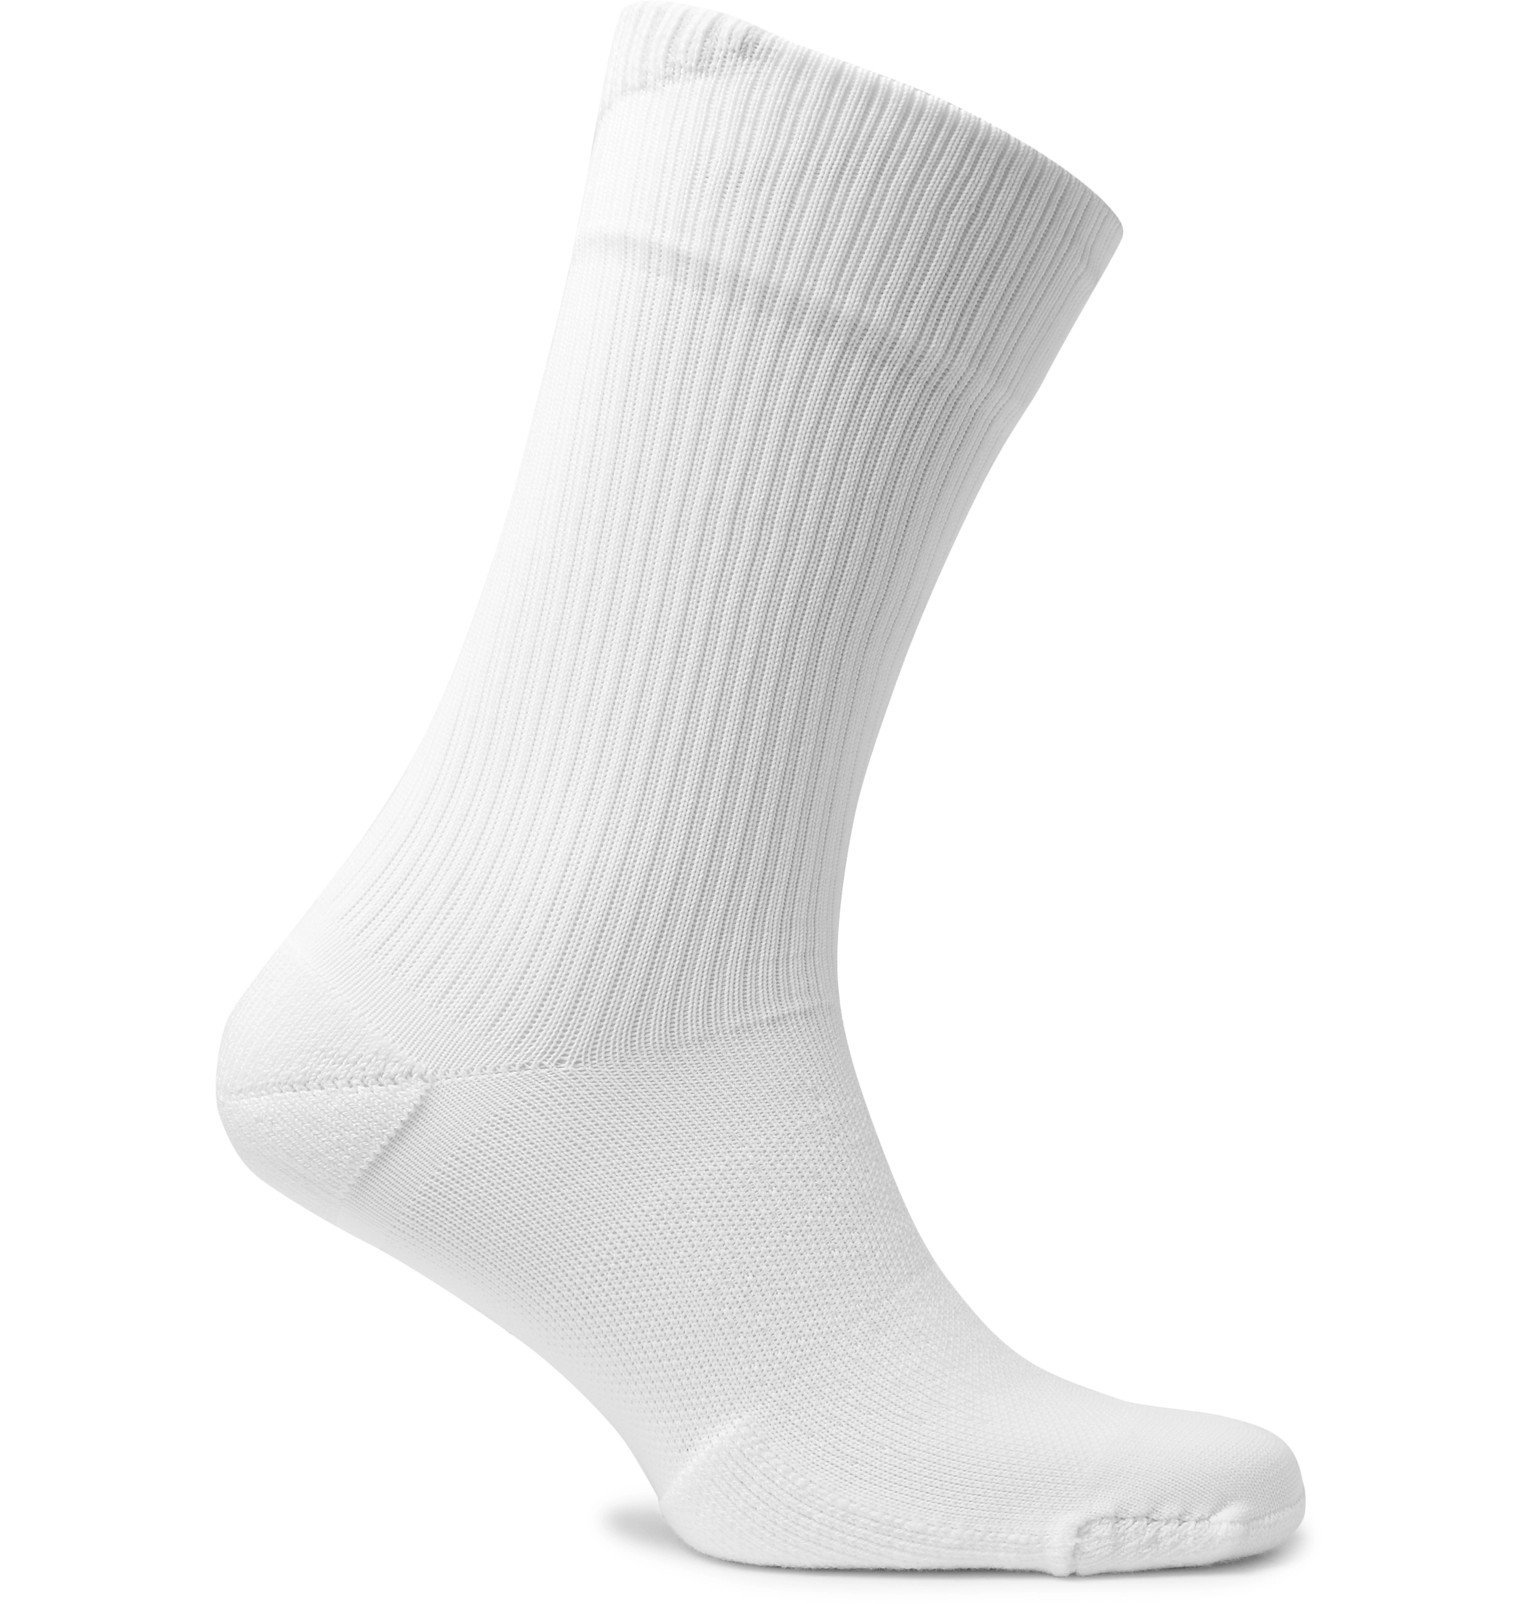 Nike Running - Spark Cushioned Dri-FIT Socks - White